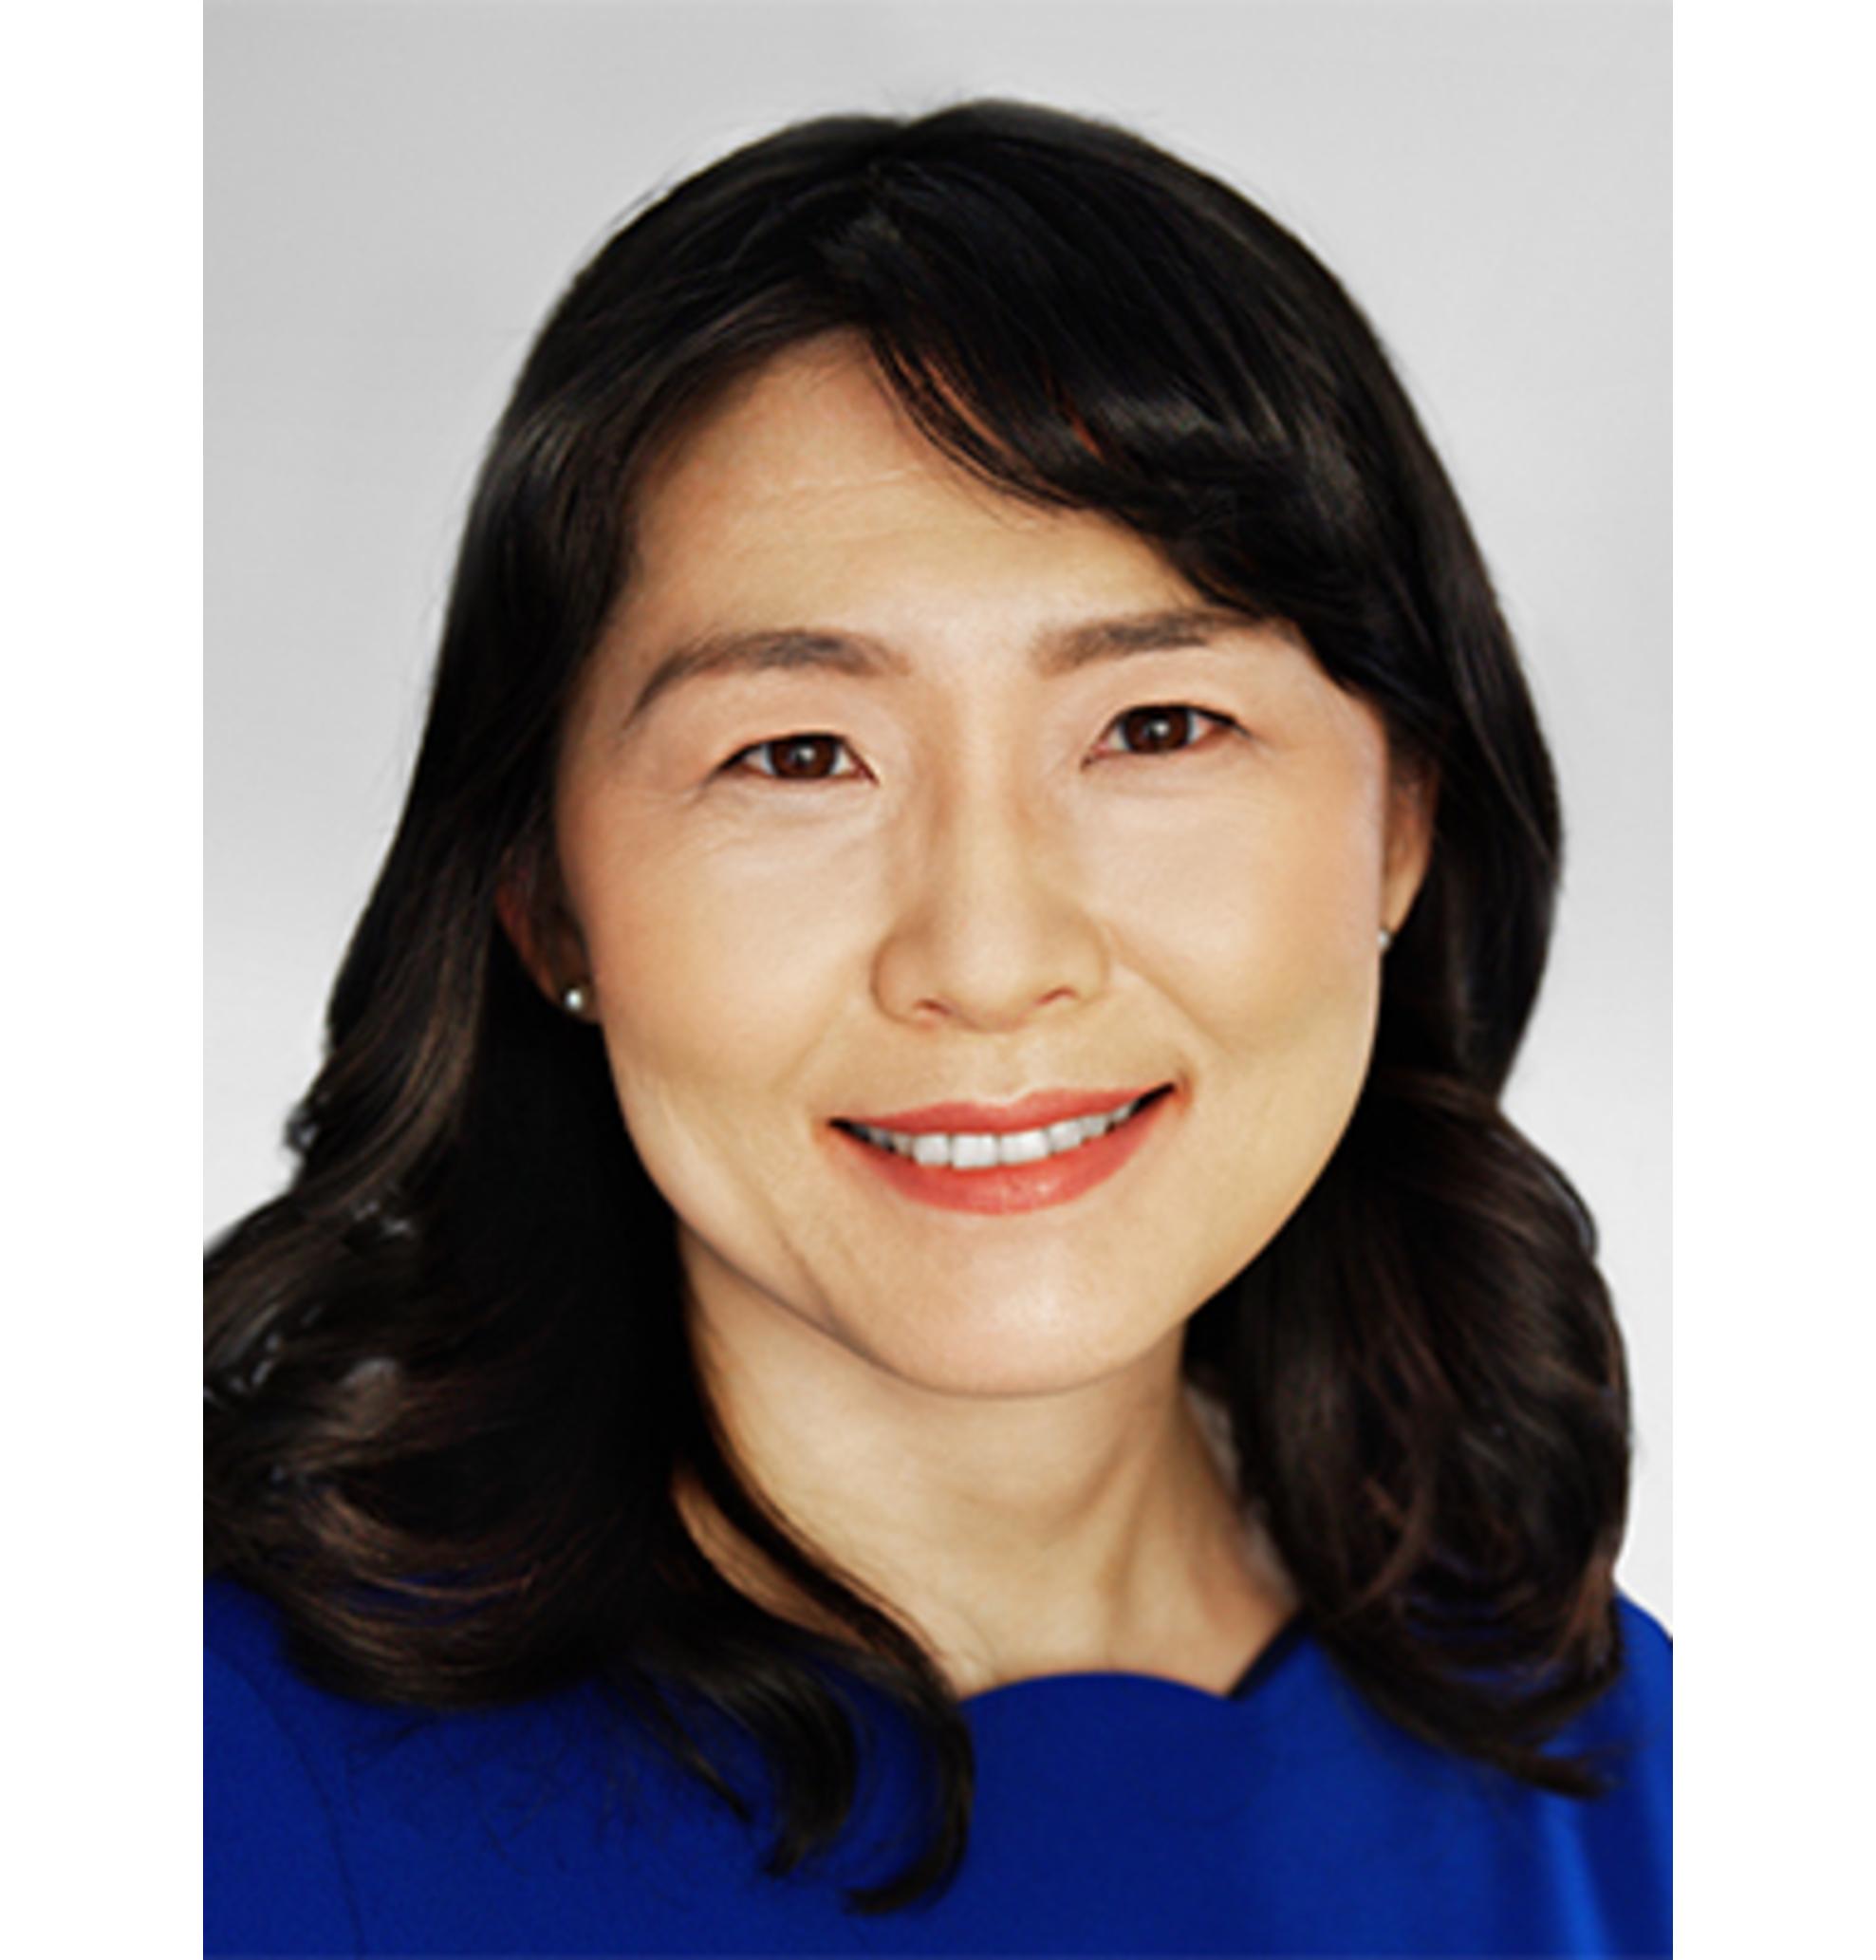 Julie Chi-hye Suk